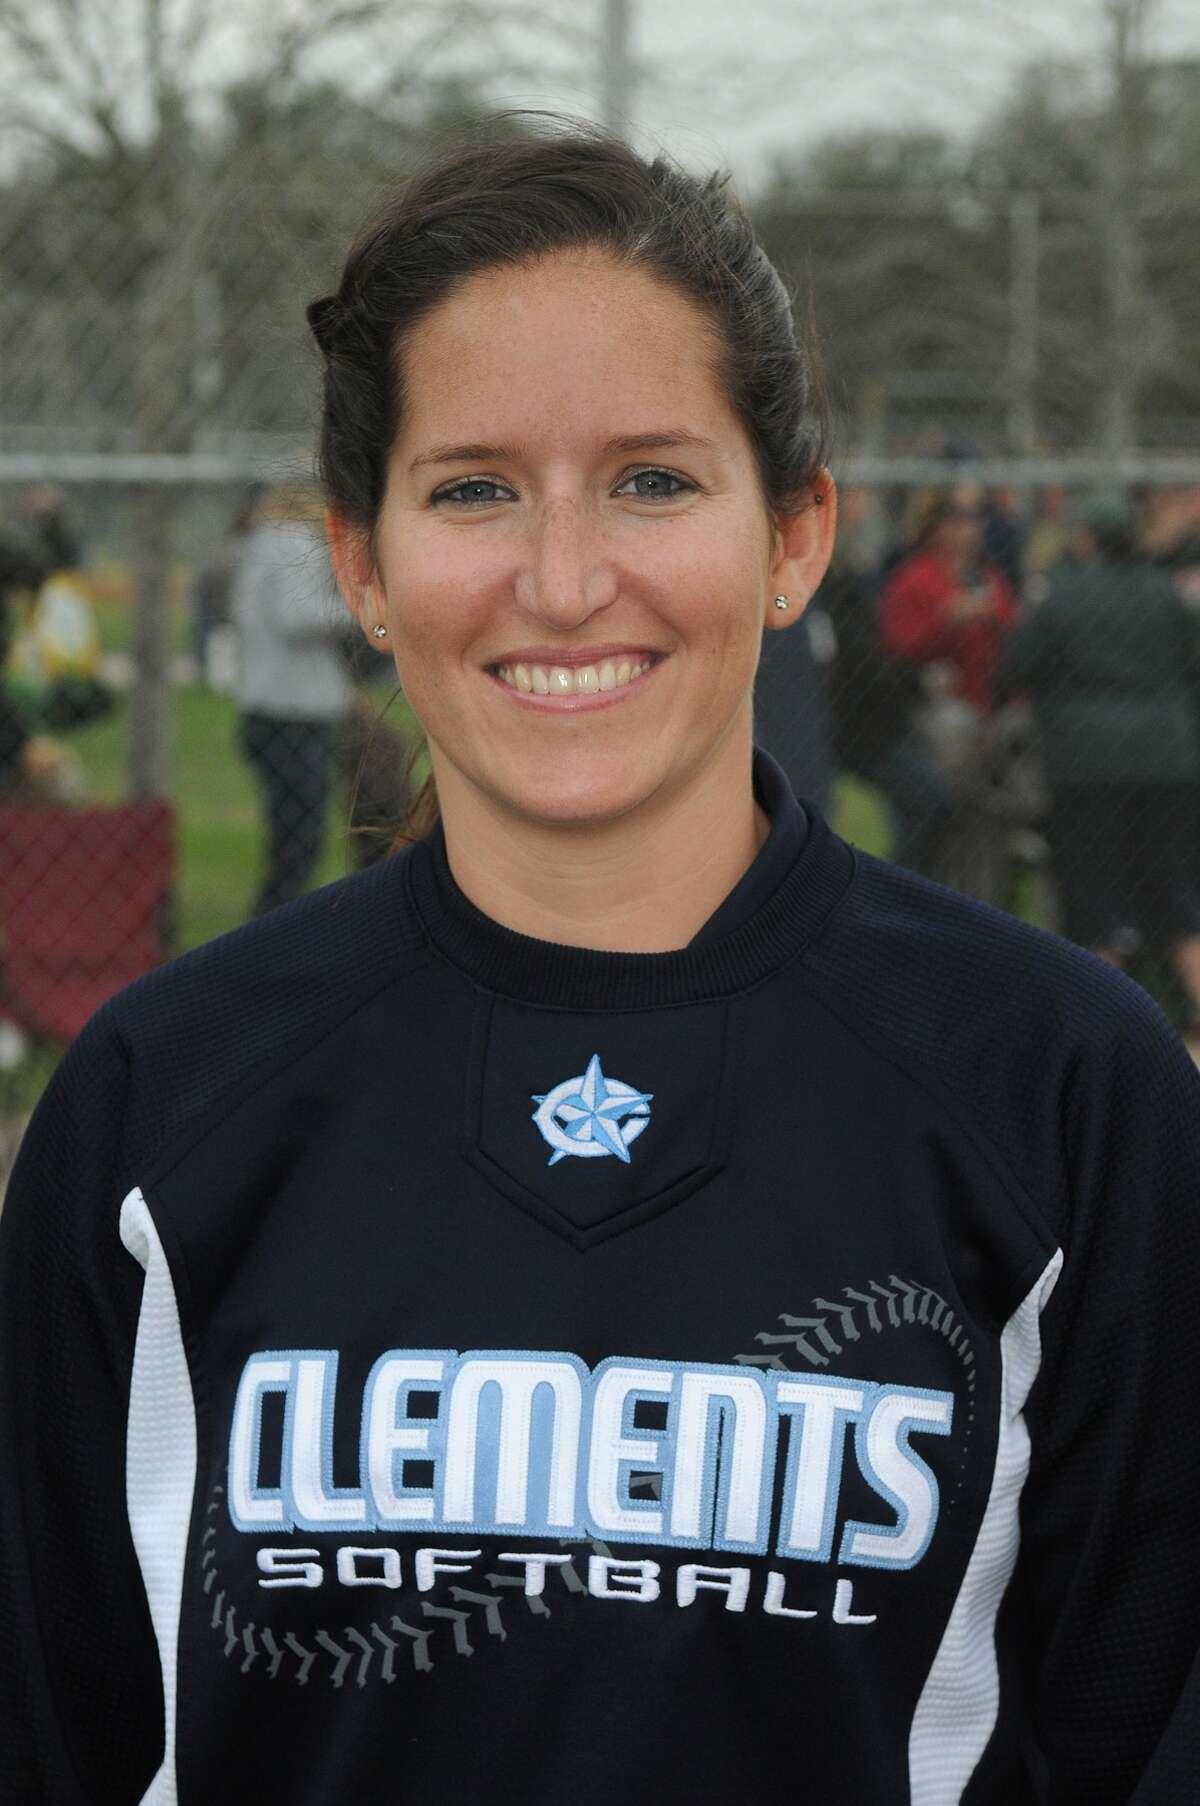 Clements Head Softball Coach Laine Skelton